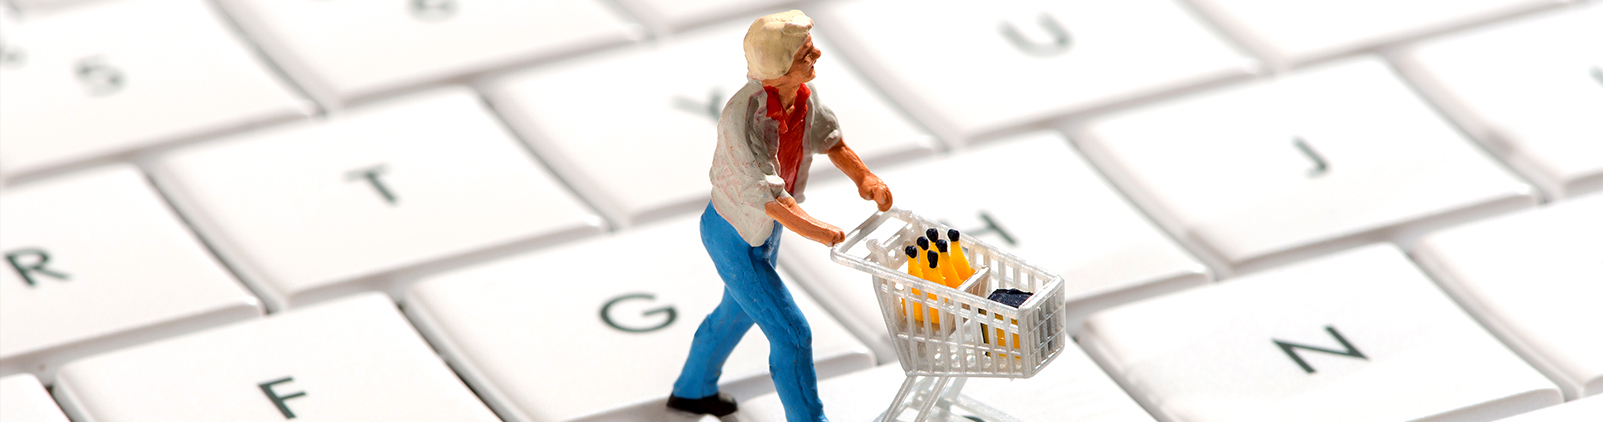 Online Retail - banner image